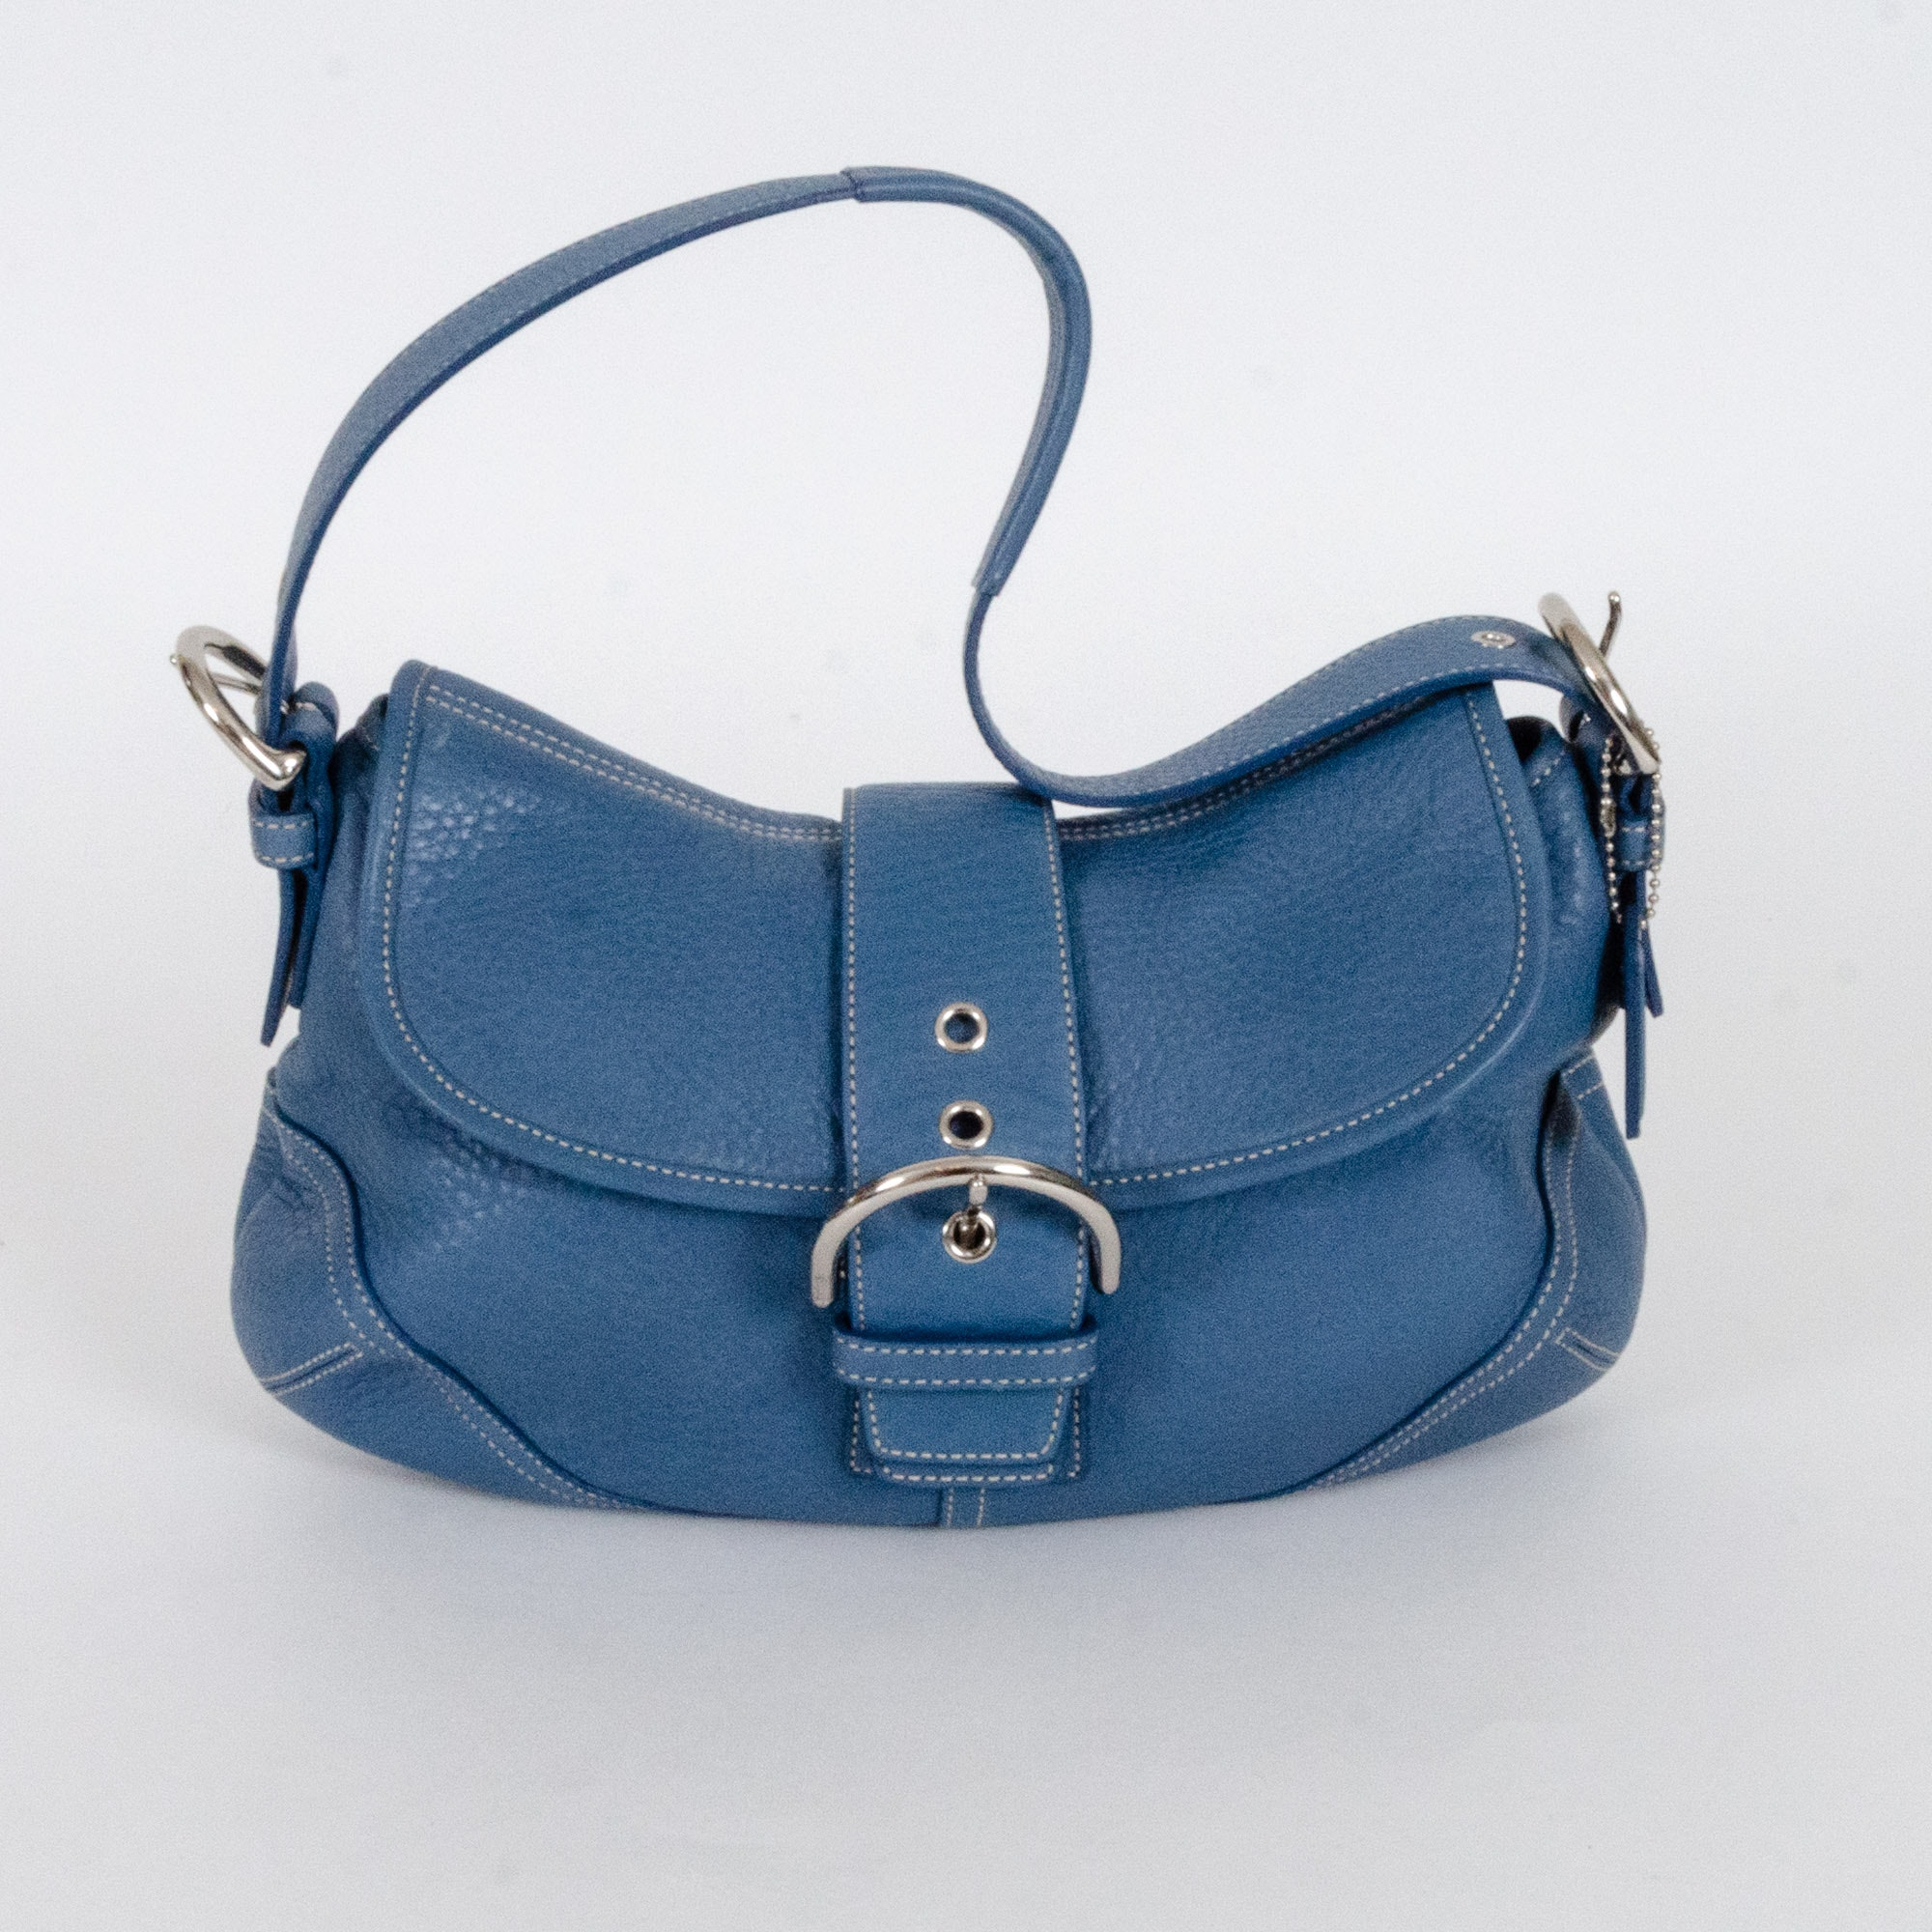 Coach Hamptons Blue Pebbled Leather Buckle Flap Demi Bag